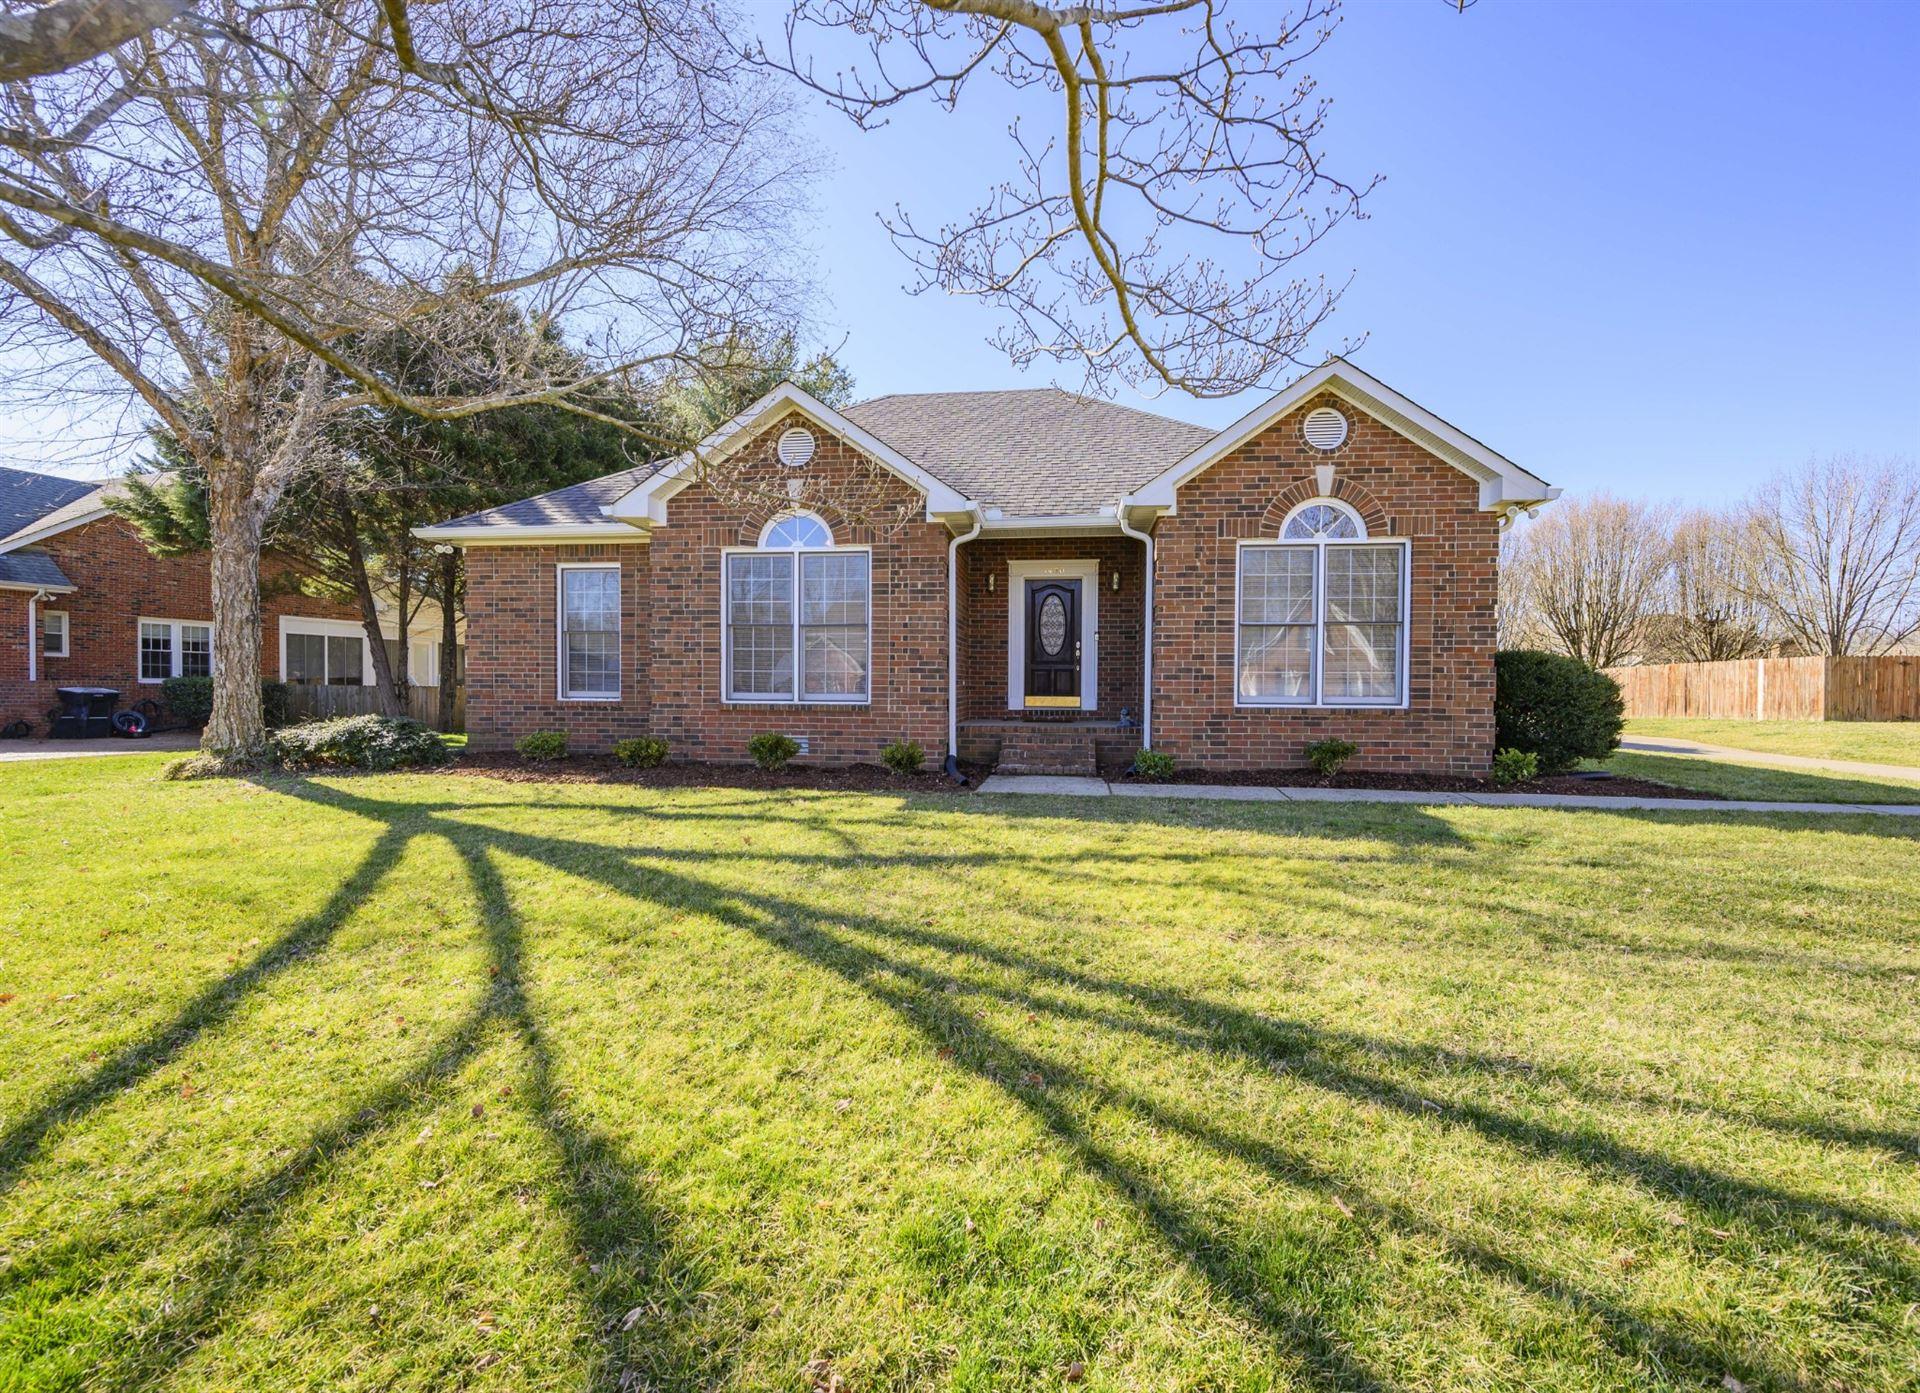 1450 Kensington Dr, Murfreesboro, TN 37130 - MLS#: 2230644